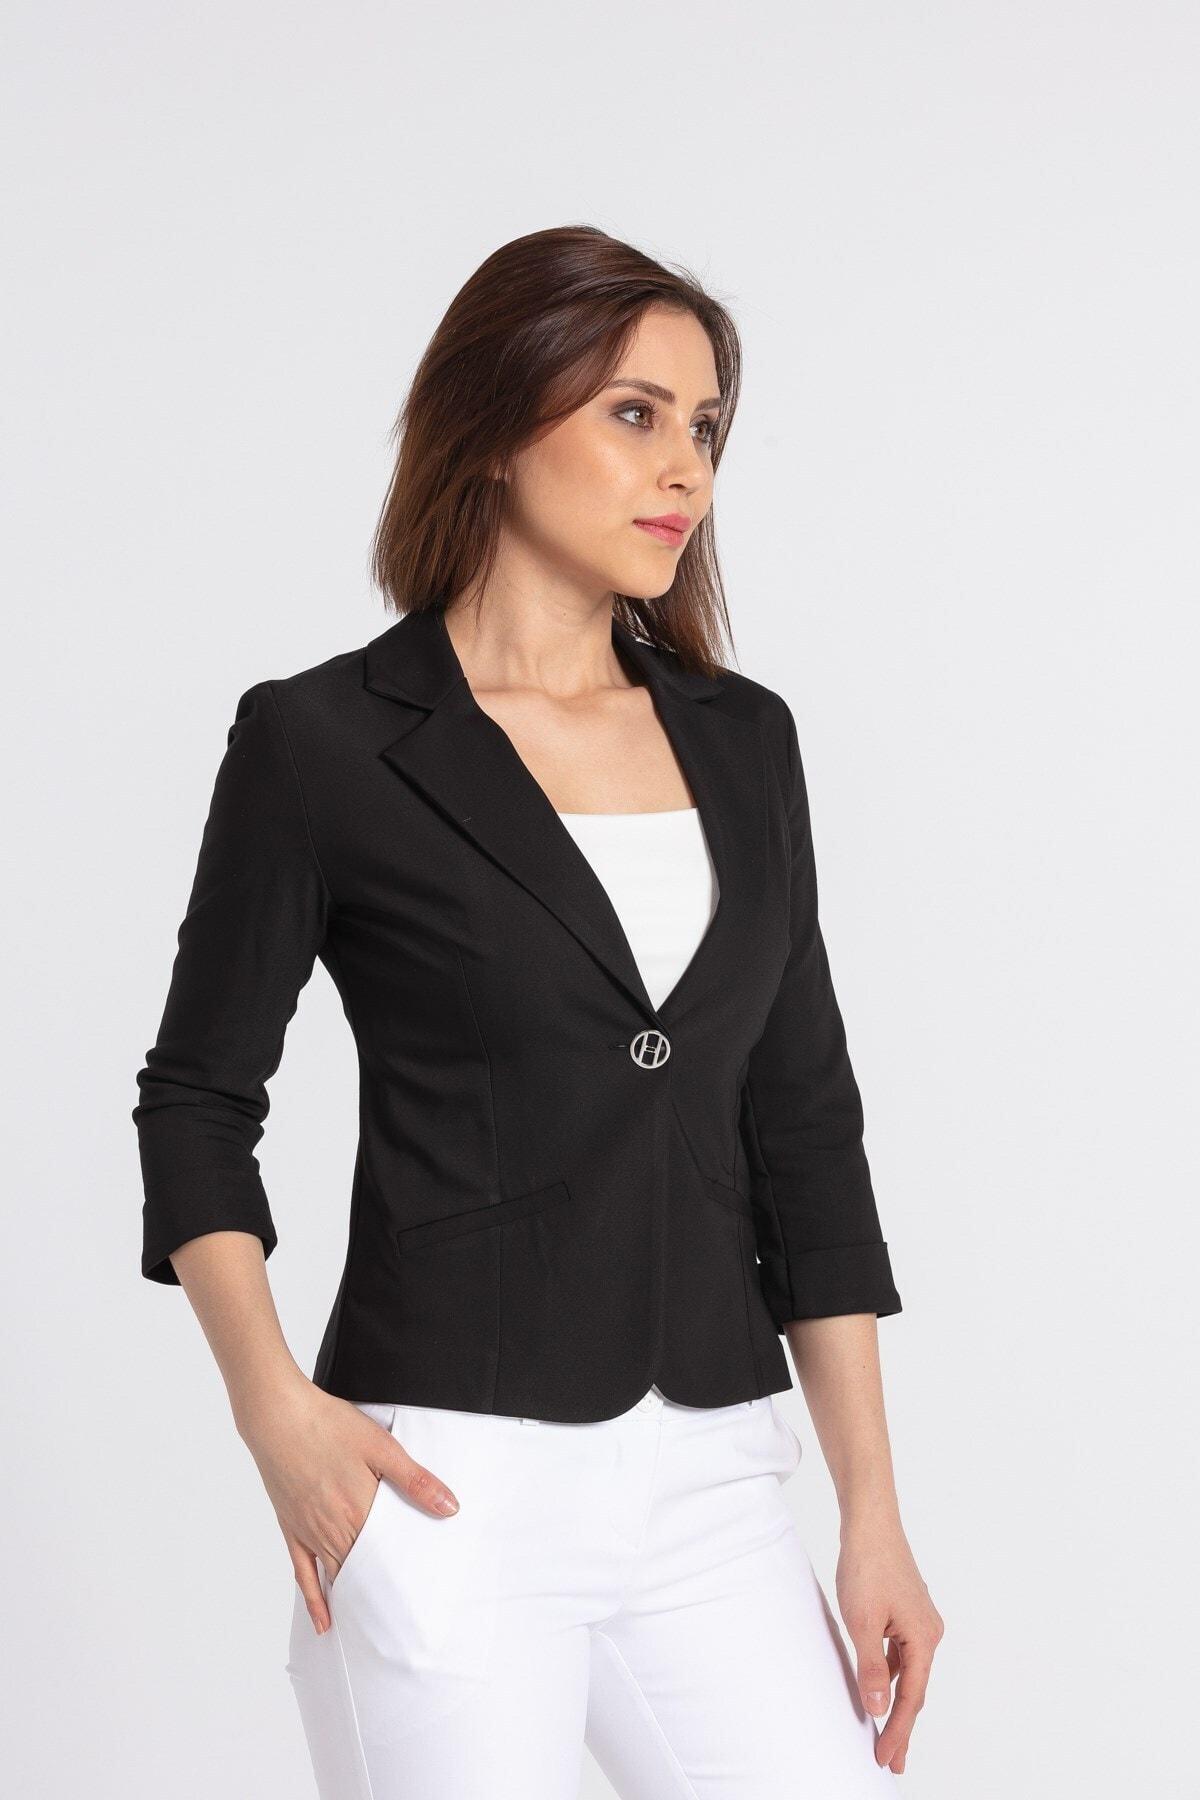 Süs Cepli Kapri Kol Düğmeli Blazer Mono Kısa Ceket-siyah